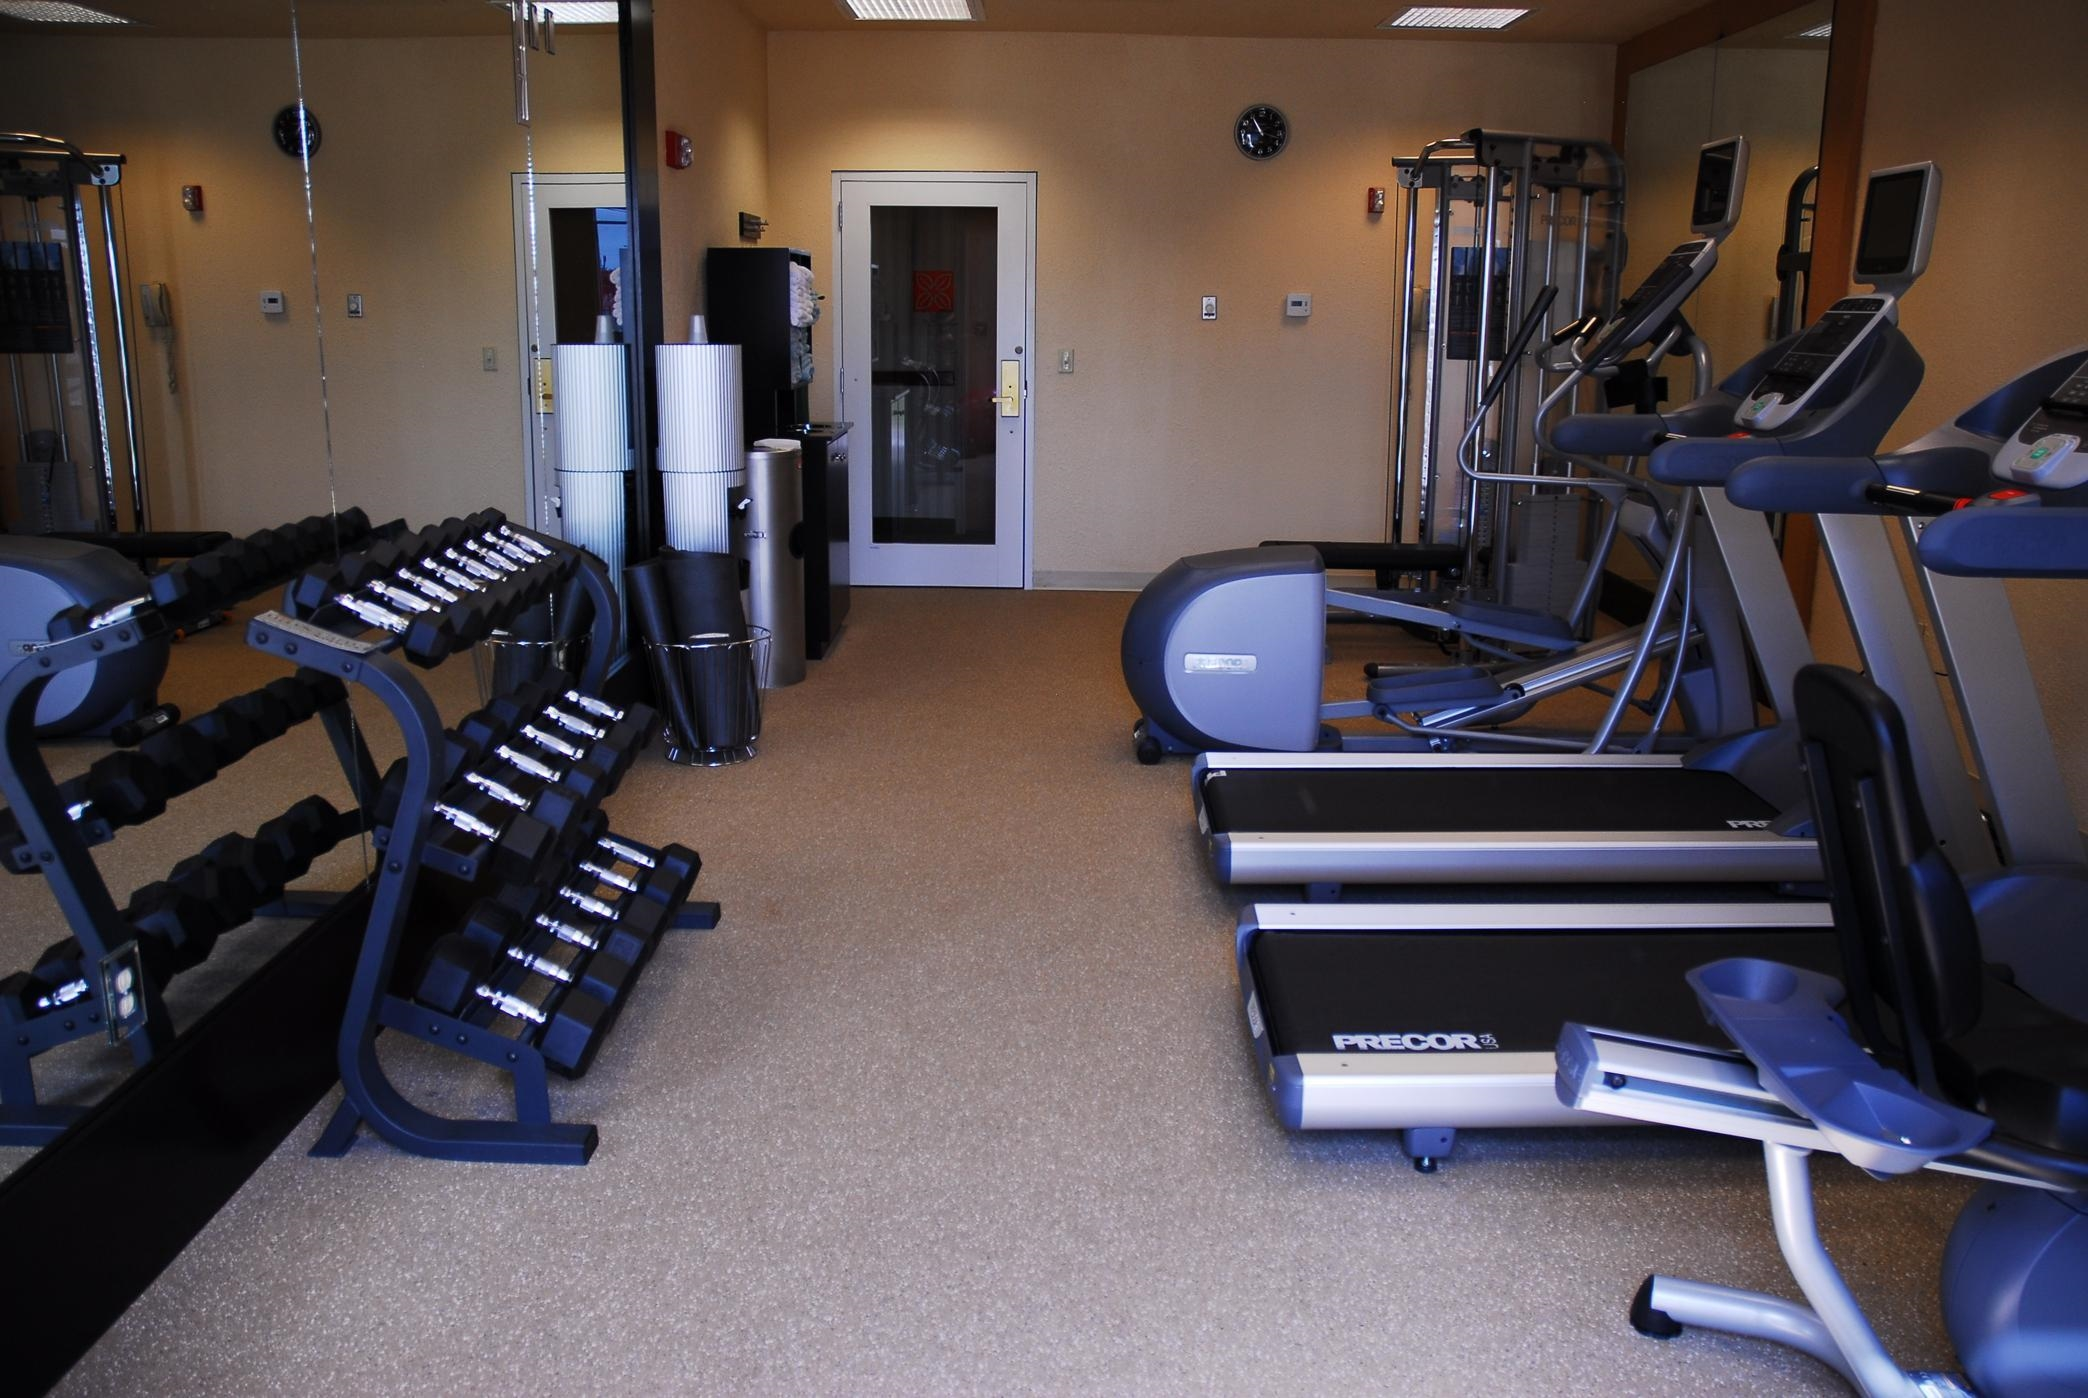 New Precor Fitness Center